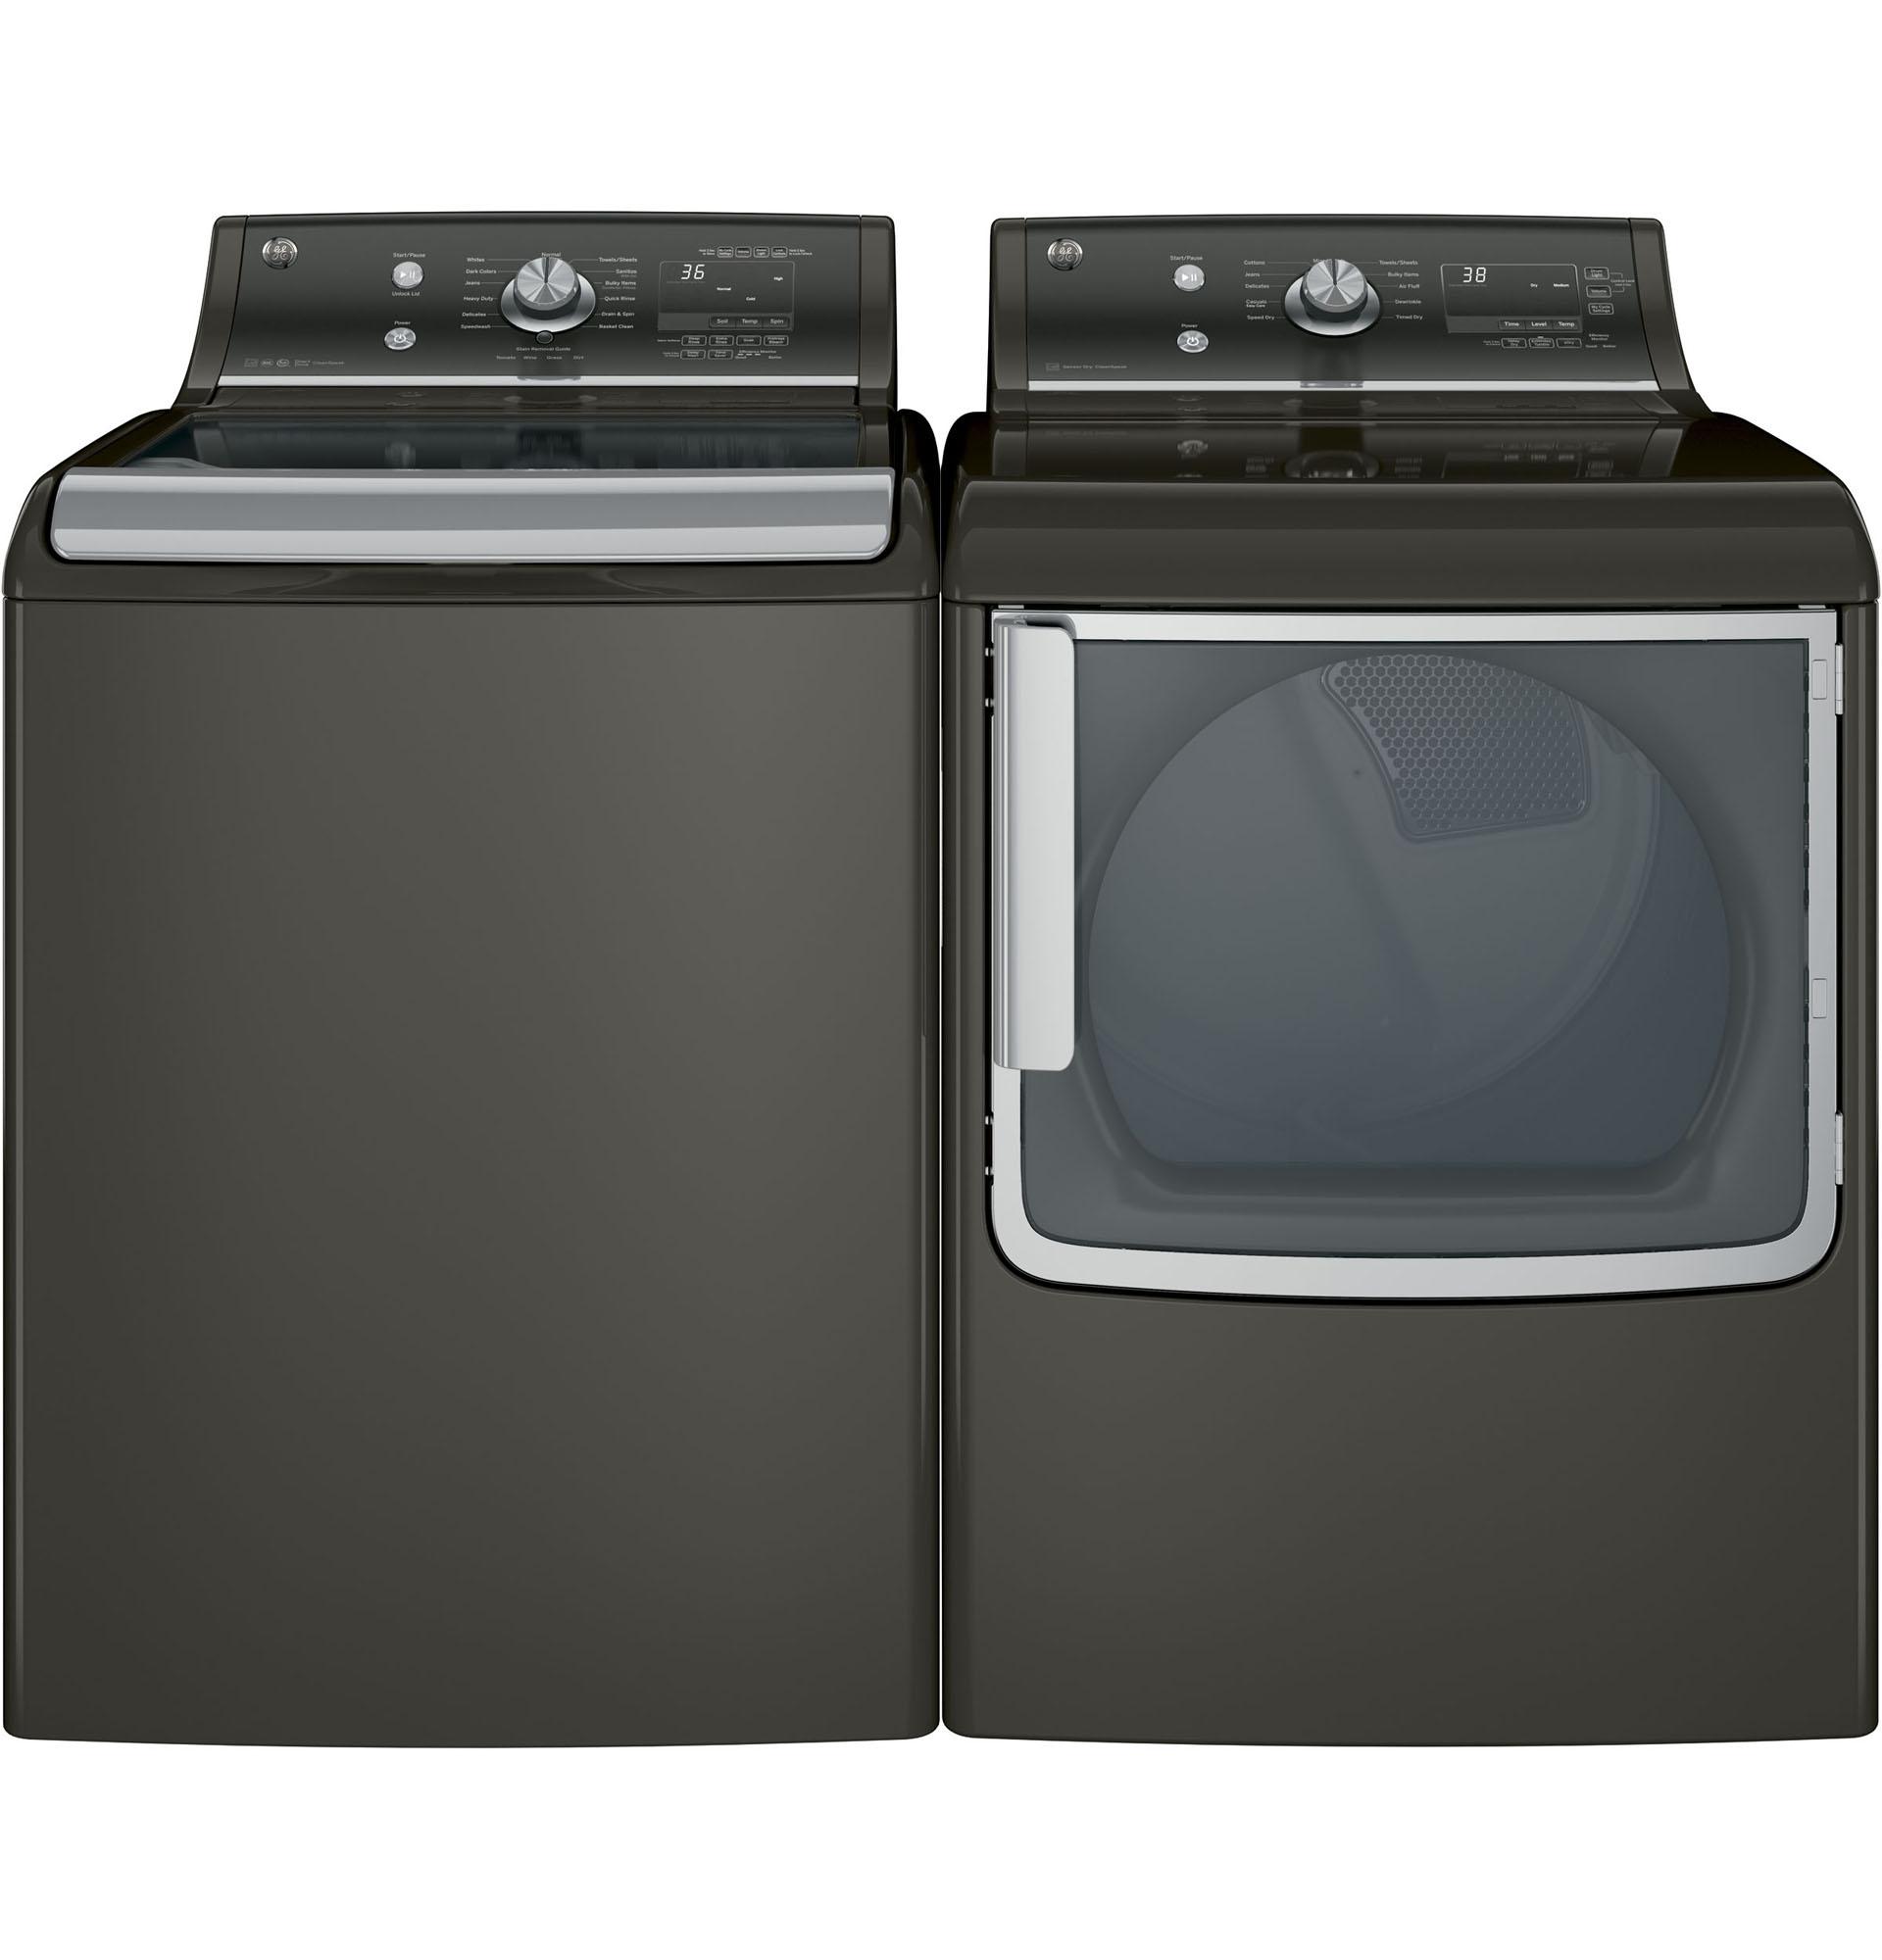 GE Appliances GTD81GSPJMC 7.8 cu. ft. Gas Dryer - Metallic